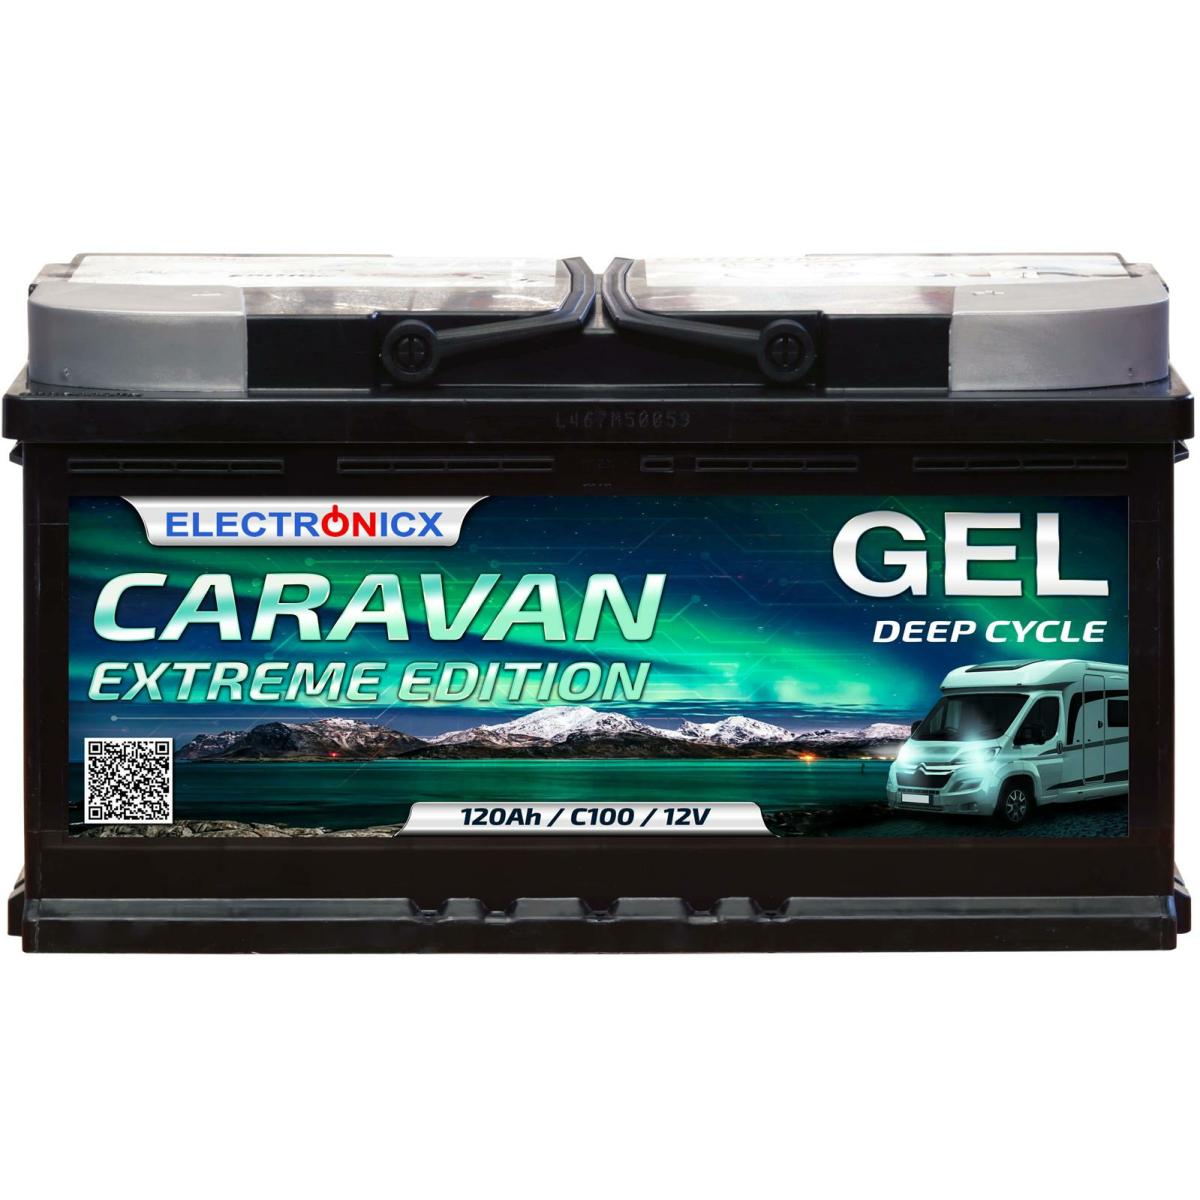 Electronicx Caravan EXTREME Edition Gel Batterie 120 AH 12V Wohnmobil Boot Versorgung